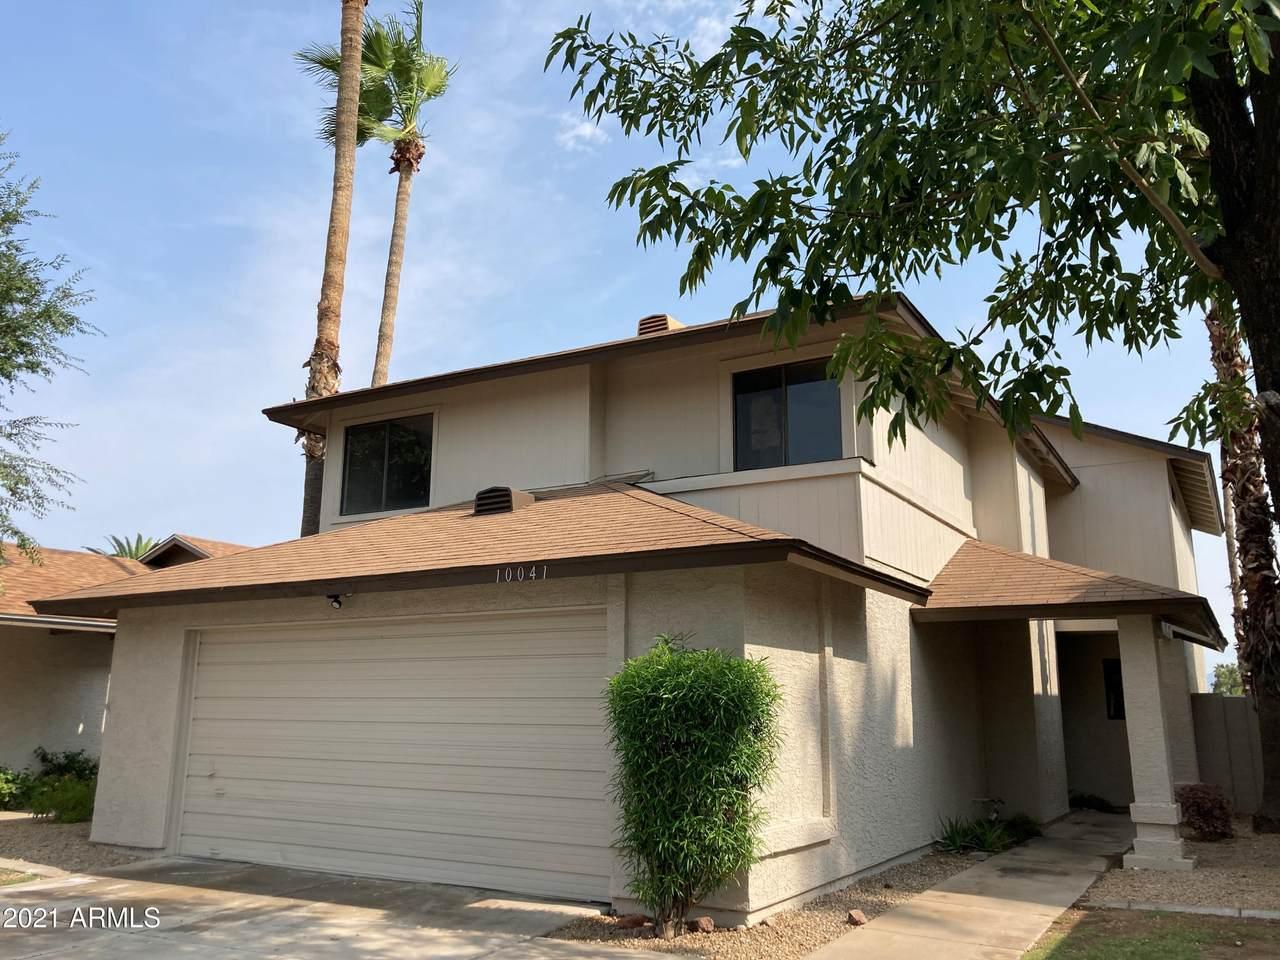 10041 Montecito Avenue - Photo 1